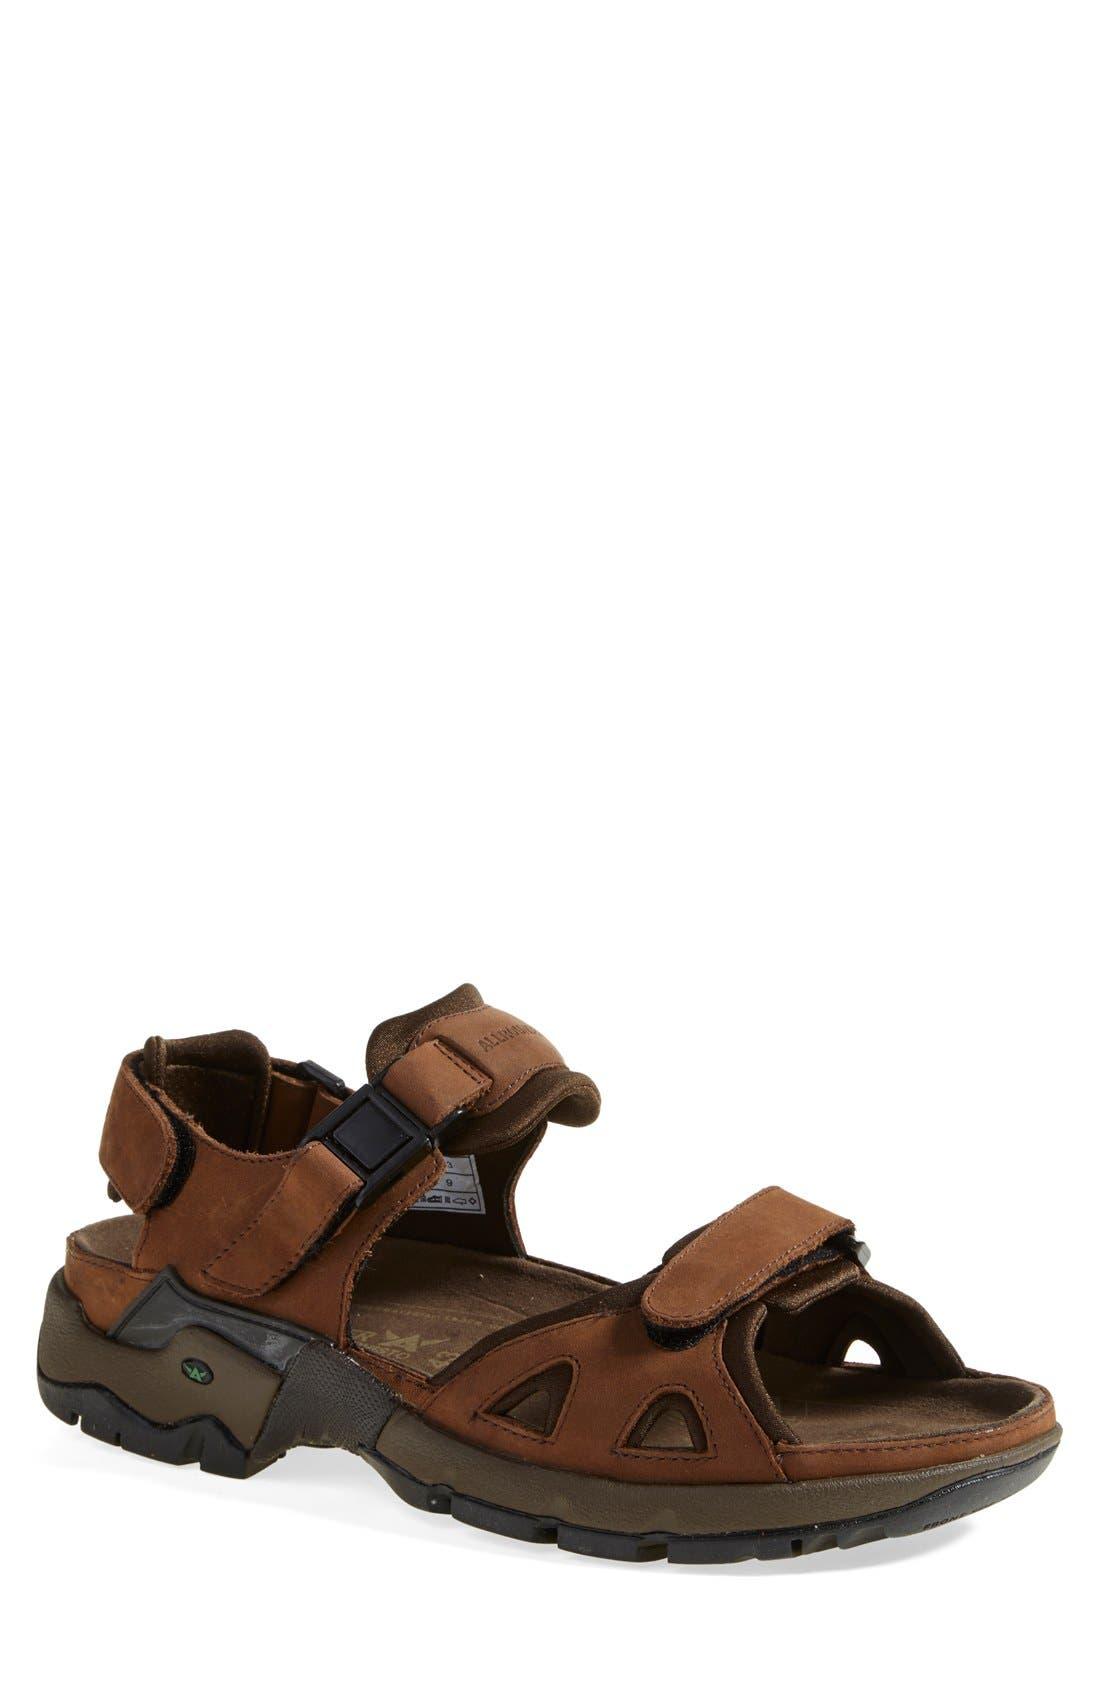 Mephisto Shoes Nordstrom Austin Flats Millie Beige 39